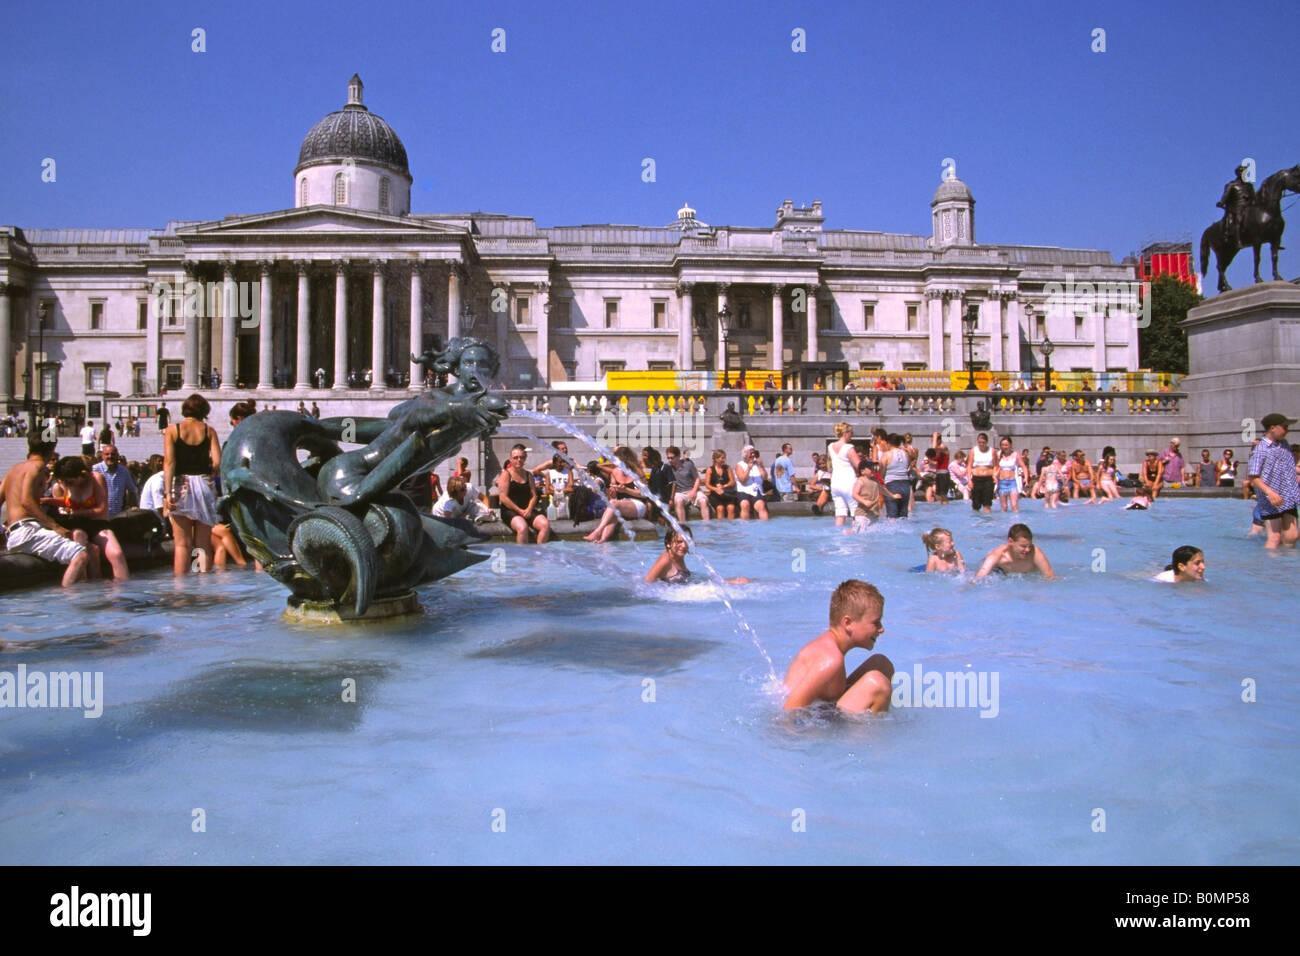 Trafalgar Square heatwave 2003 - London - Stock Image